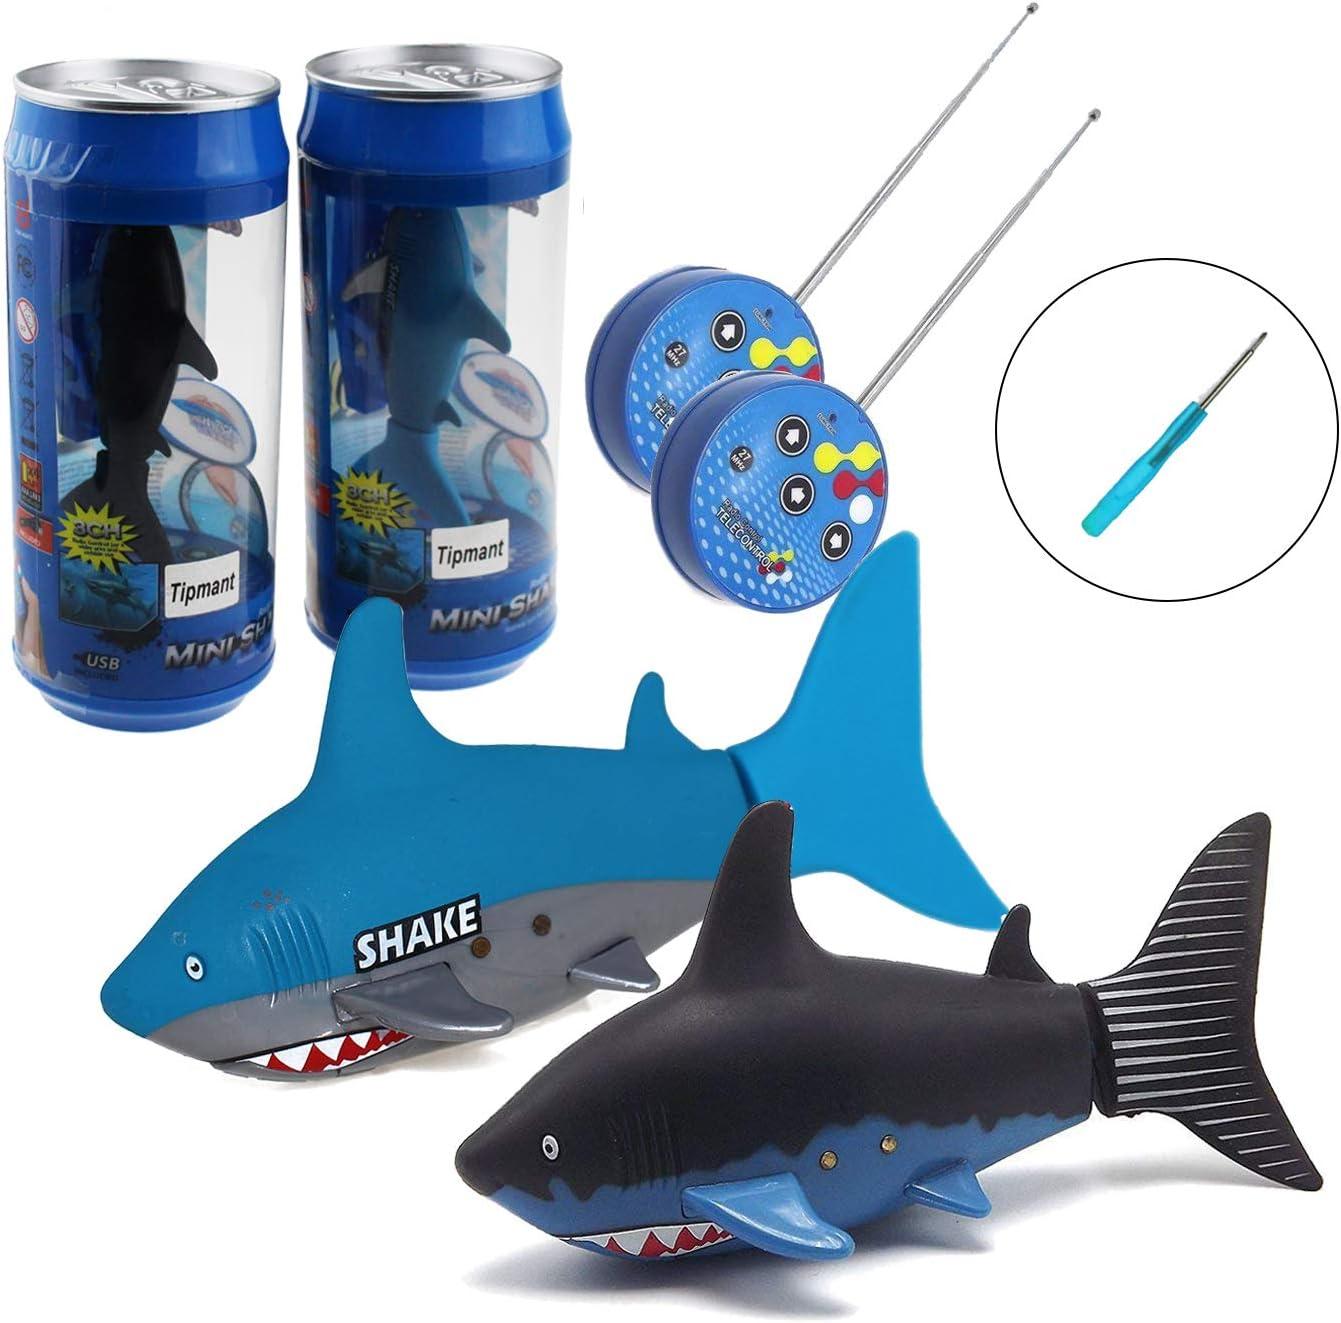 2 Pack Tipmant Mini RC Fish Shark Radio Remote Control Boat Ships & Submarine Swim in Water Pool Bathtub Kids Electric Toy (Black & Blue)